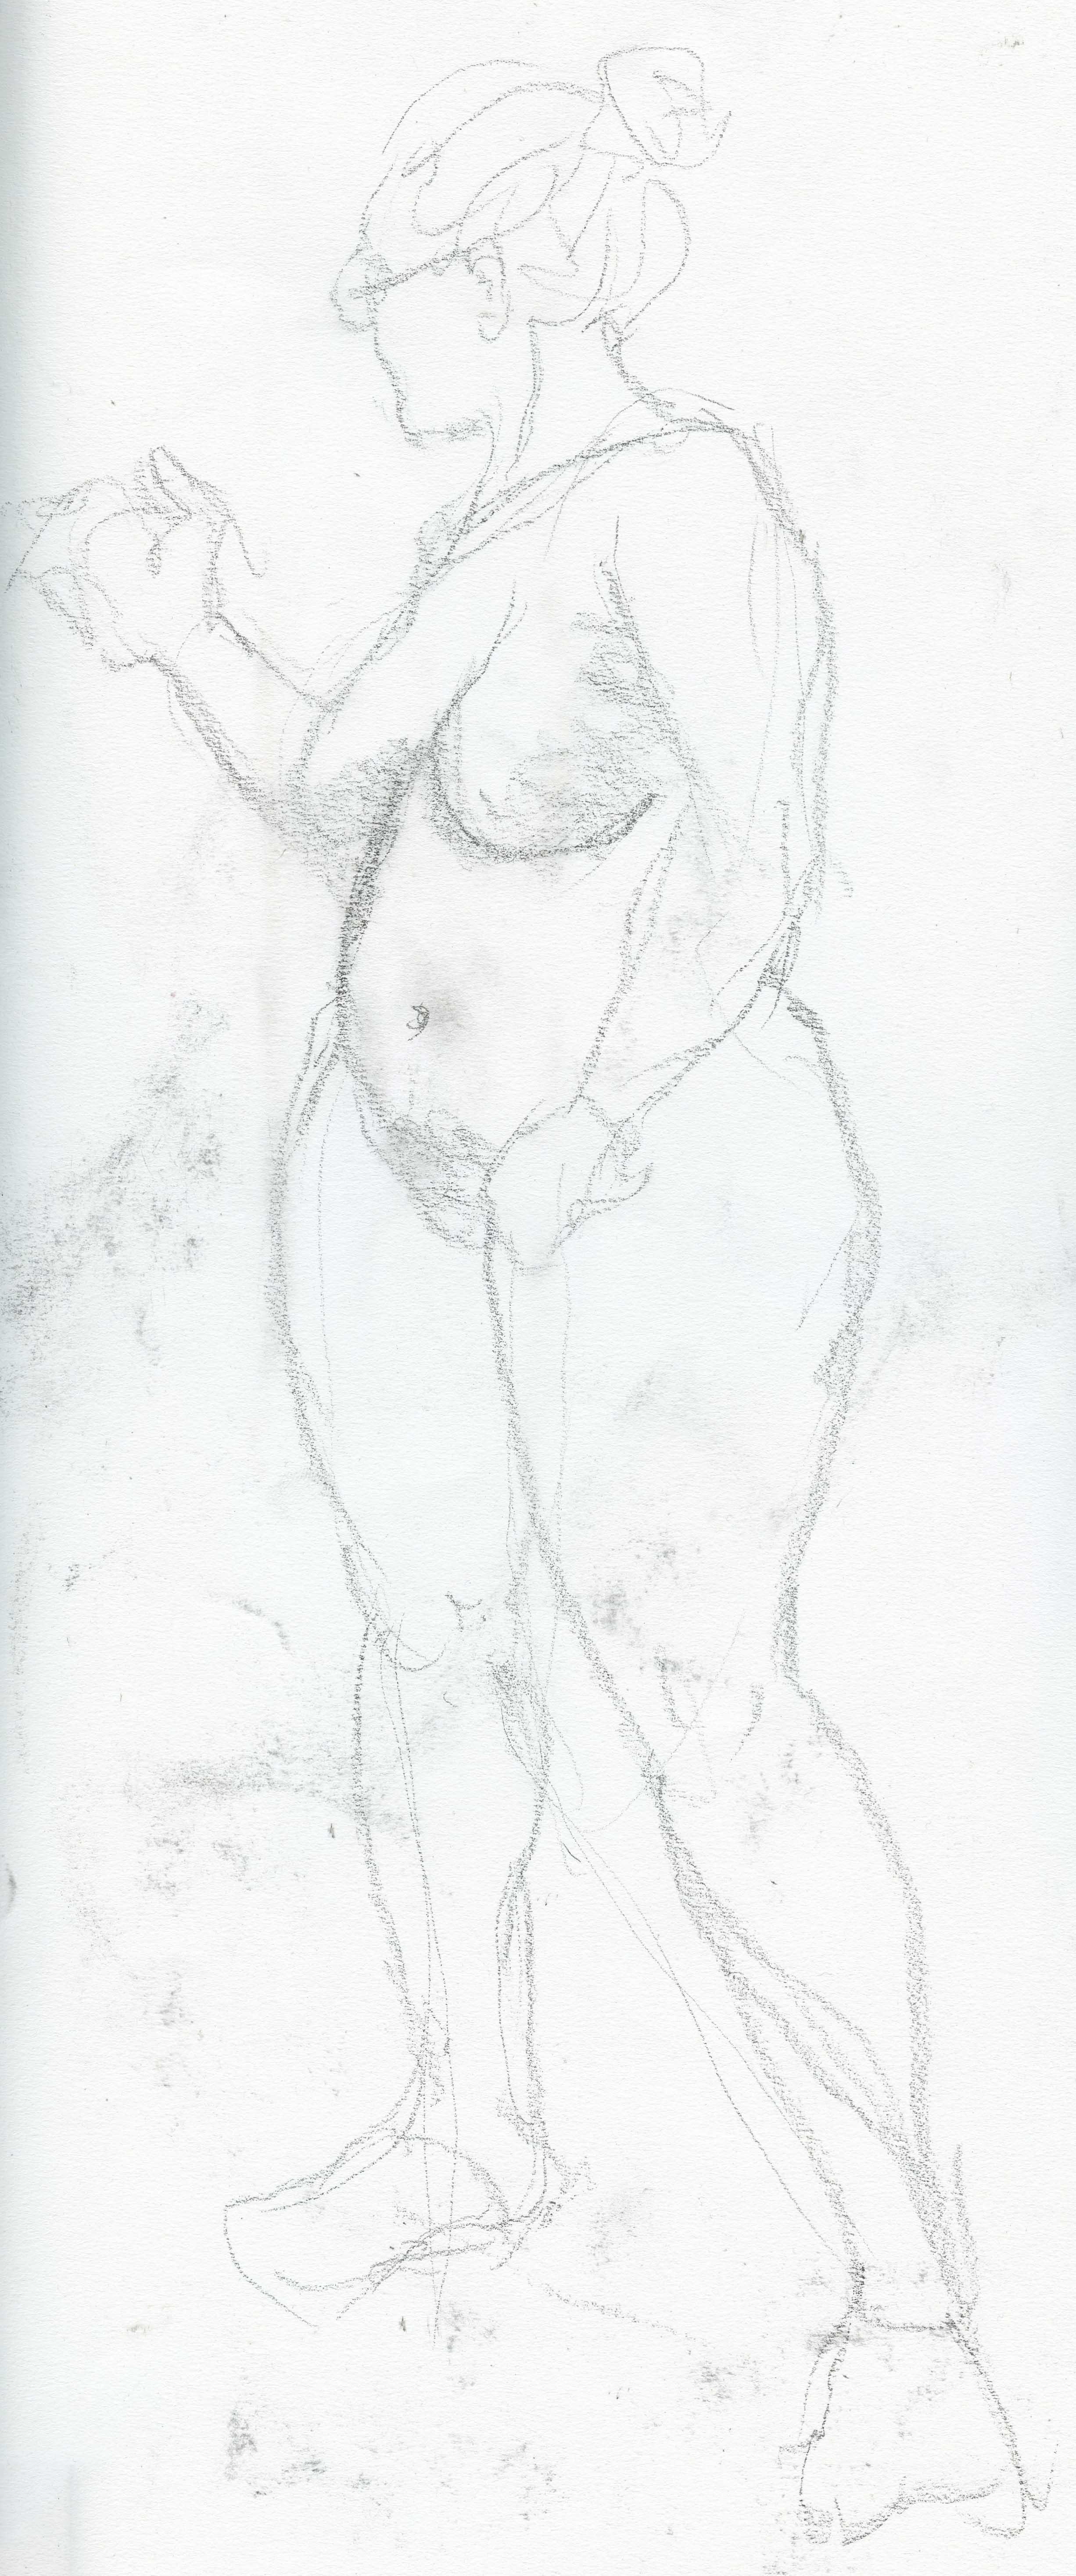 Noomis - Etudes, croquis & Wip [ Nudité ] - Page 5 160913102345642852